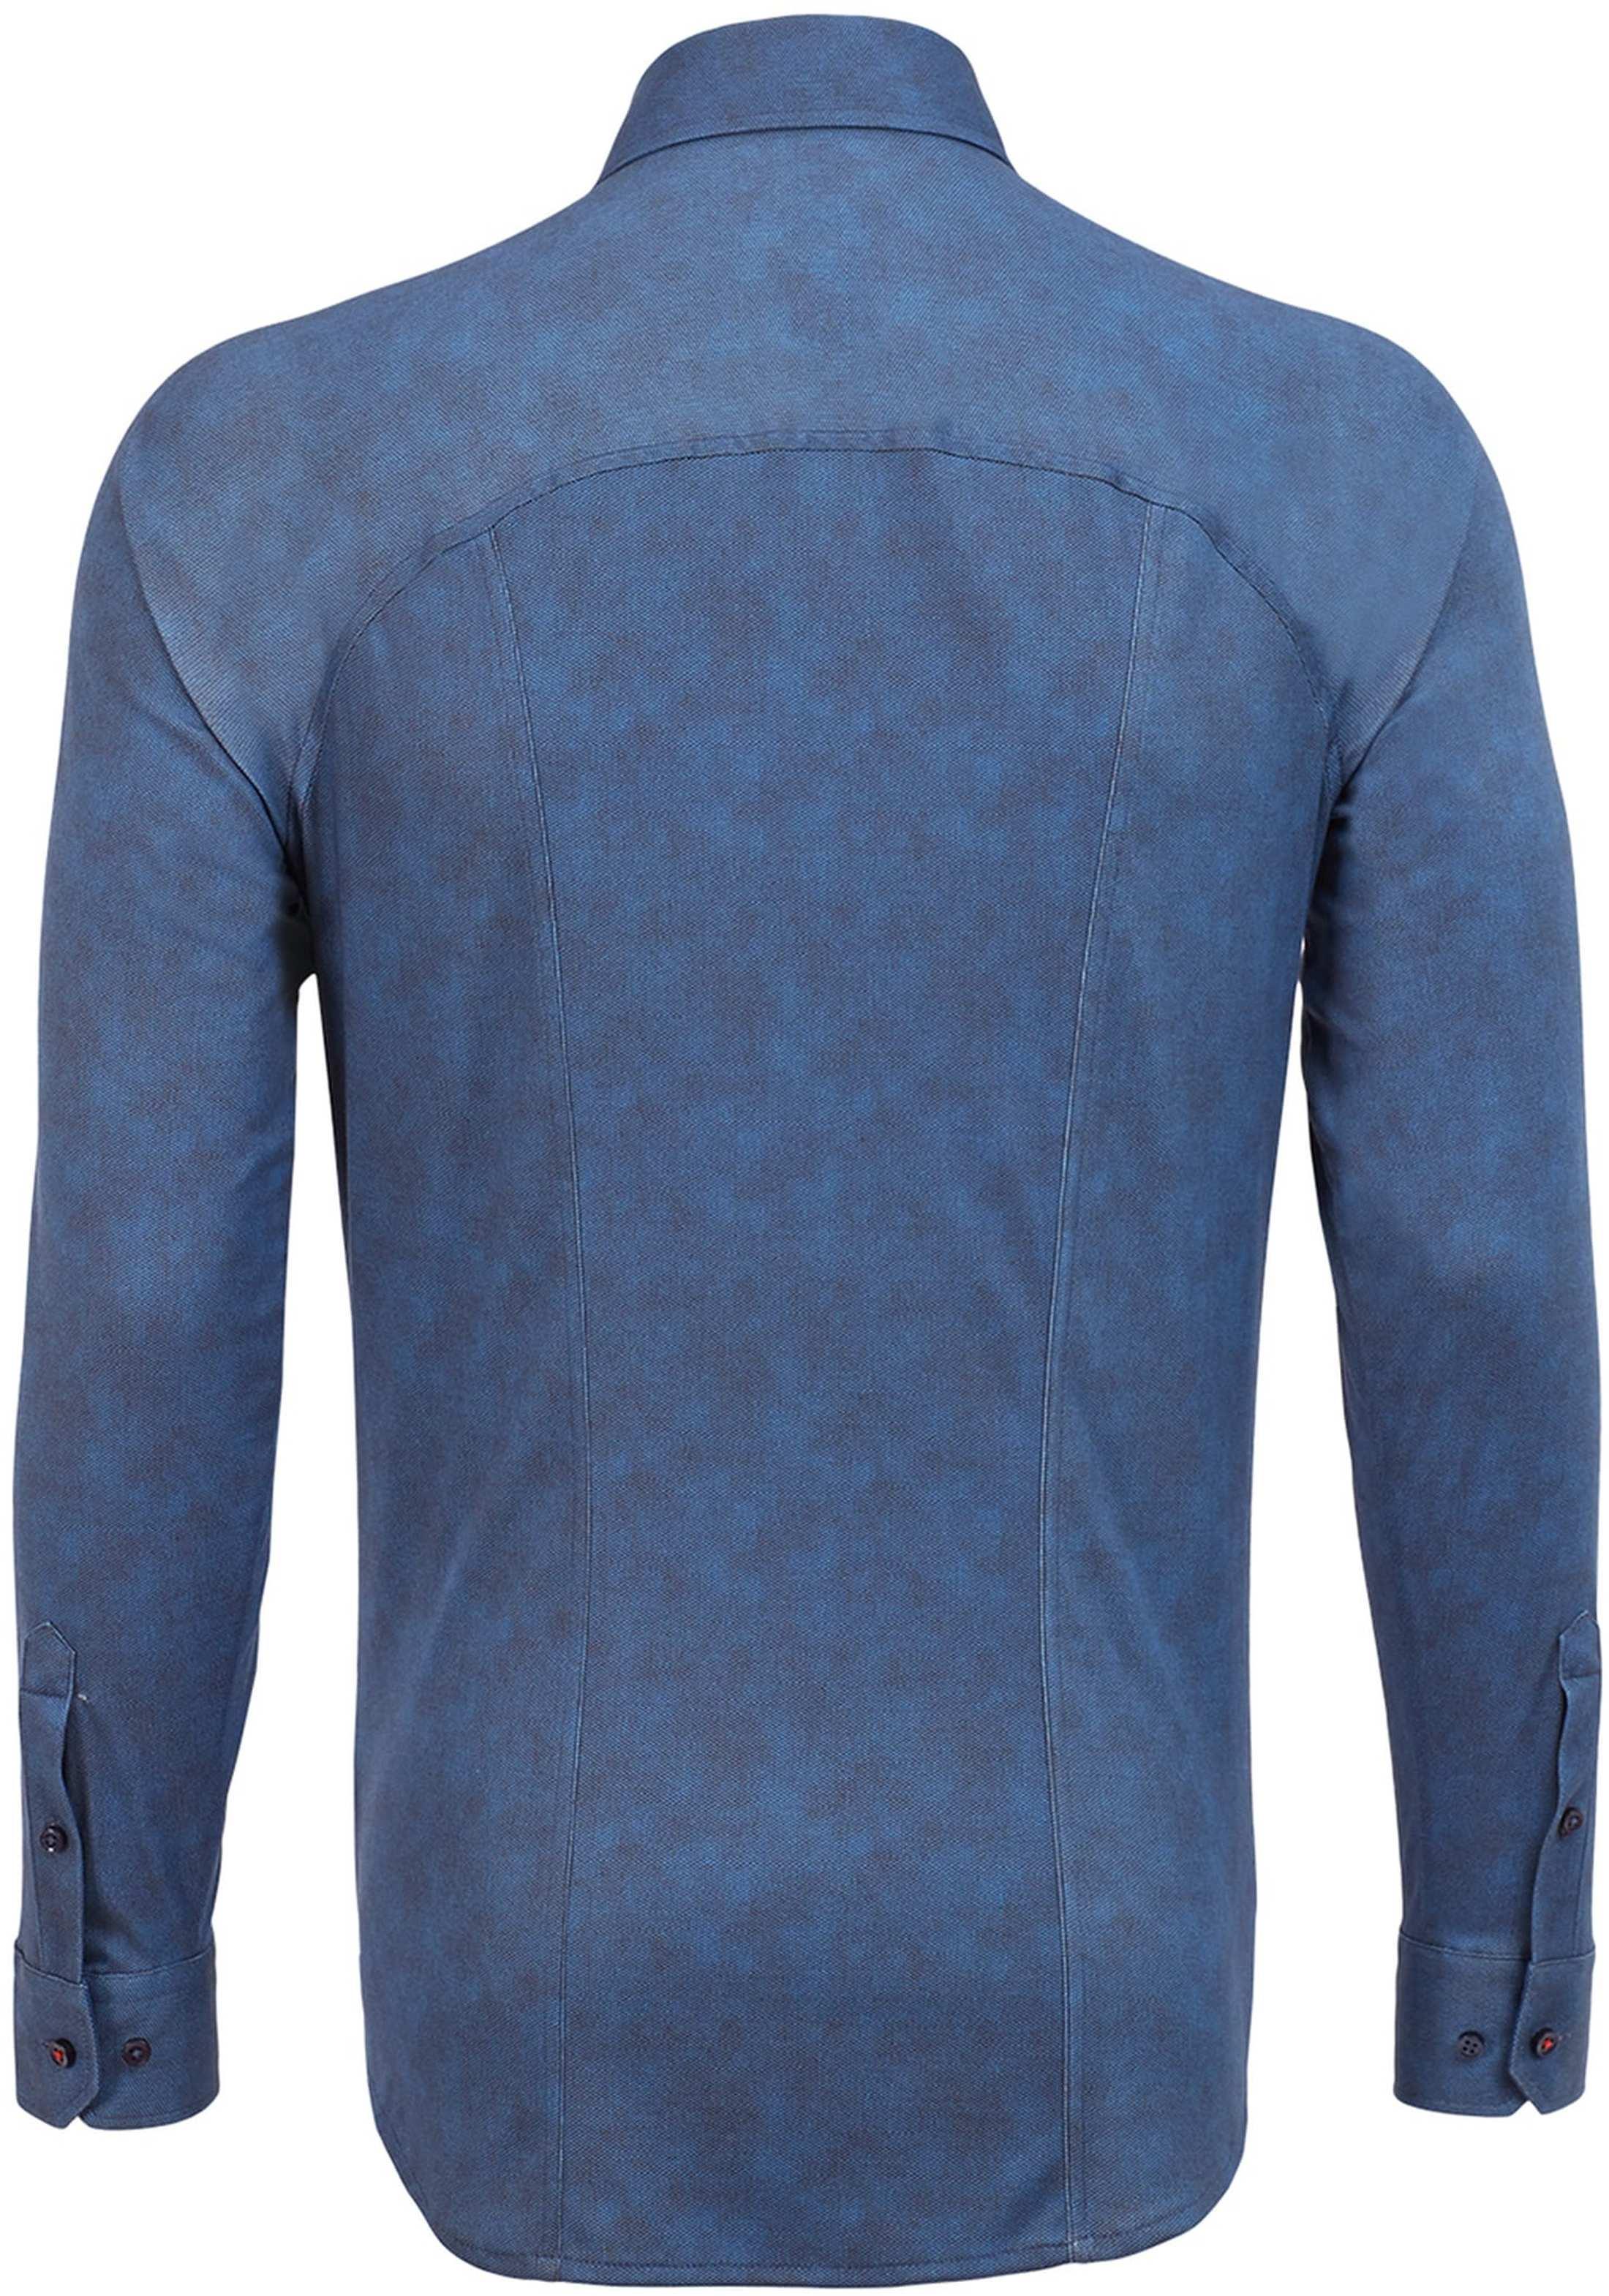 Desoto Overhemd Strijkvrij Donkerblauw Oxford foto 1